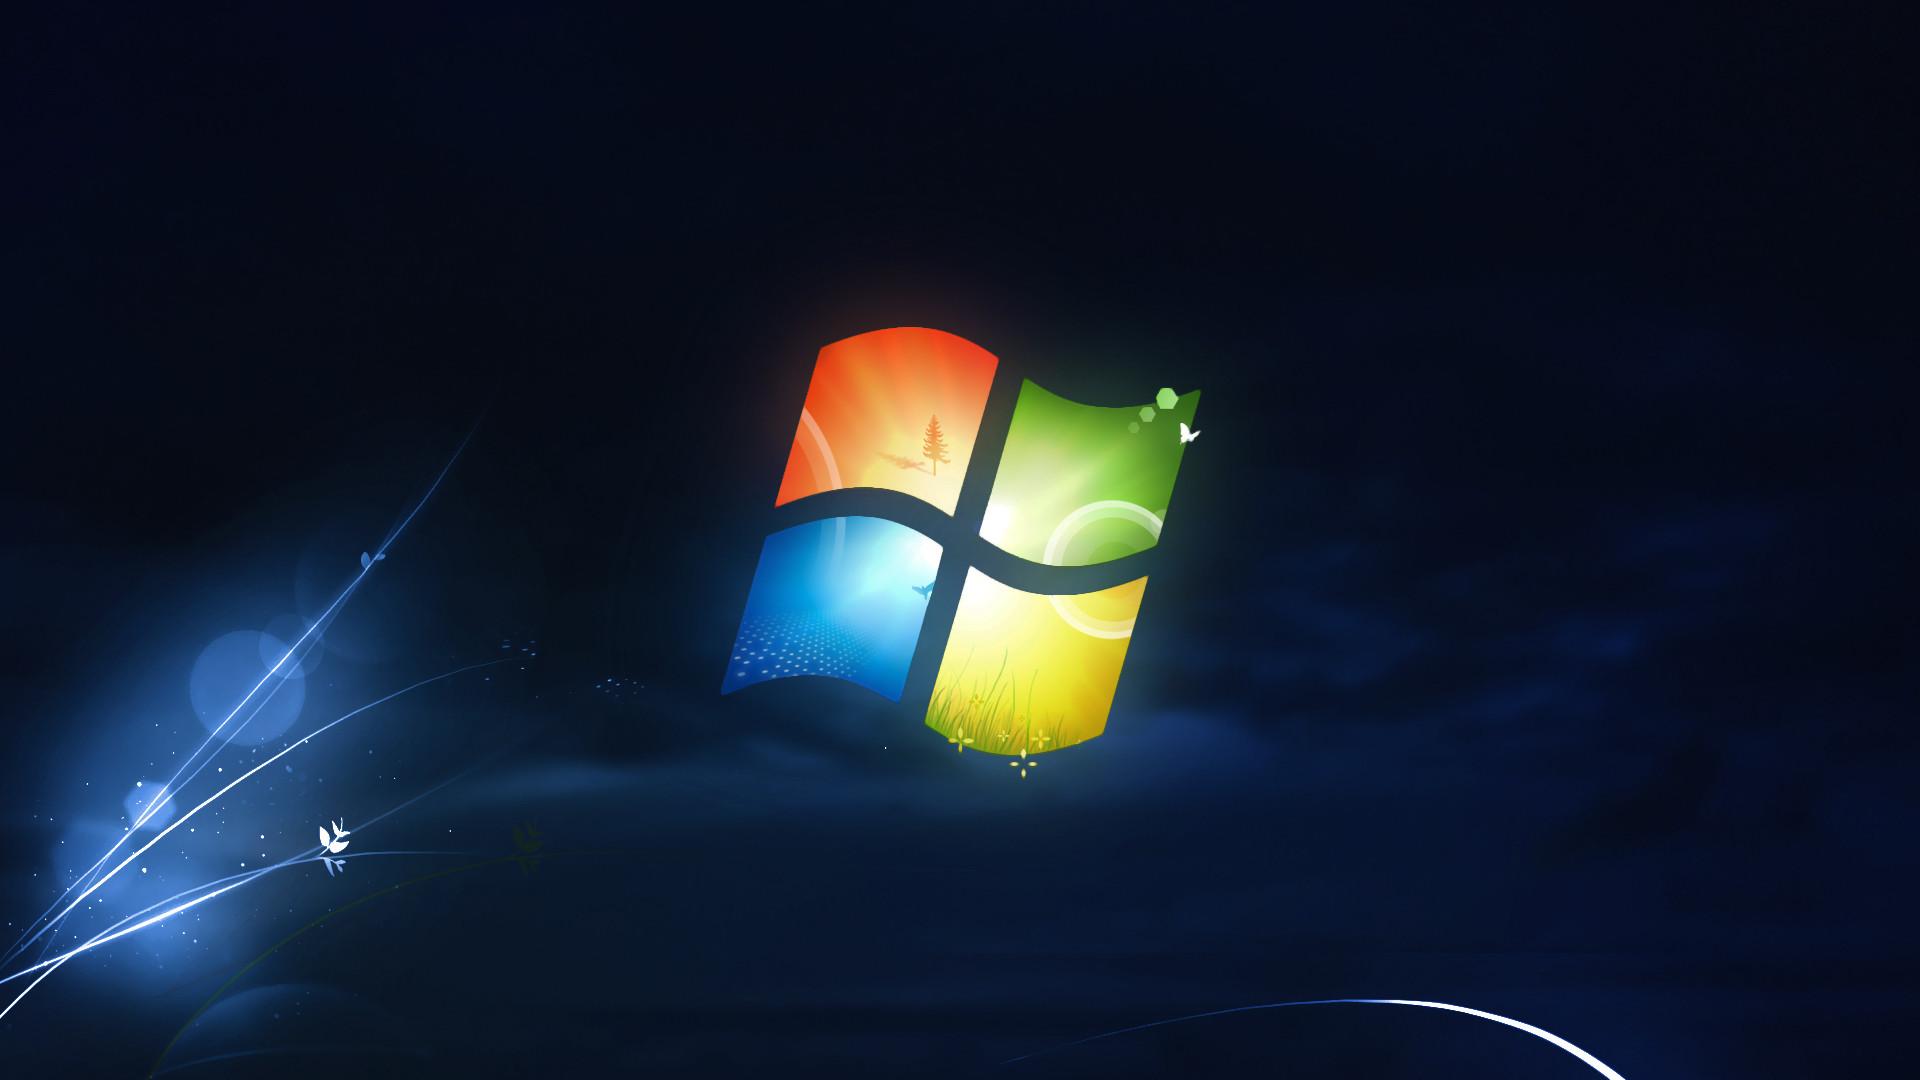 Microsoft Windows Desktop Backgrounds 65 images 1920x1080